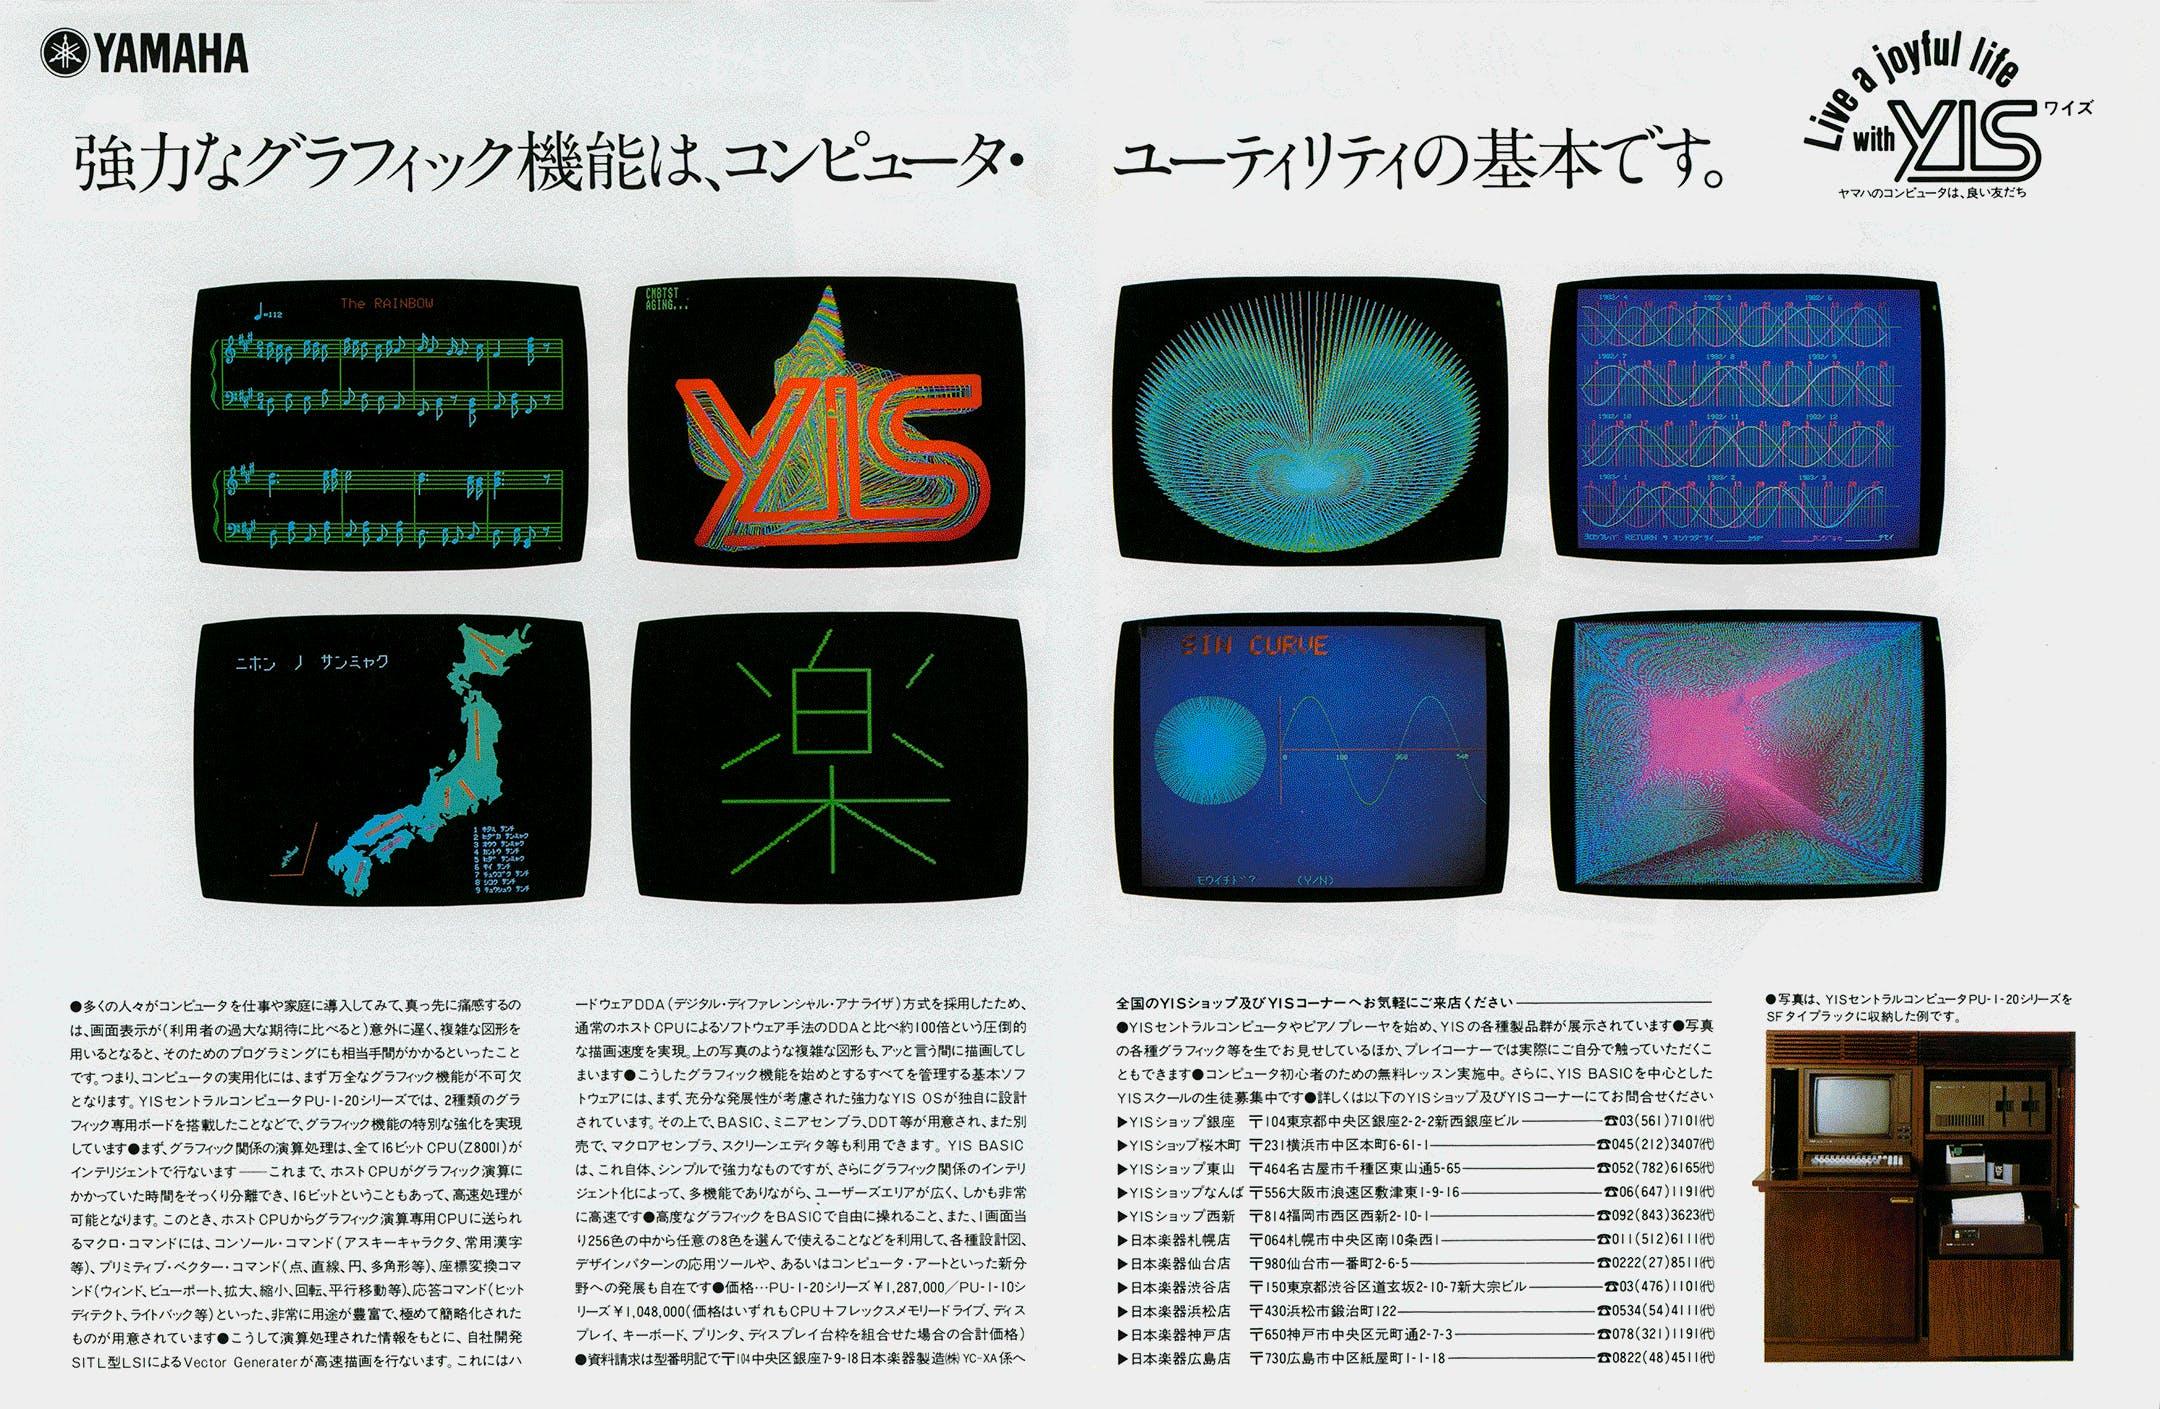 Yamaha YIS advertisement ASCII japan 6 1982